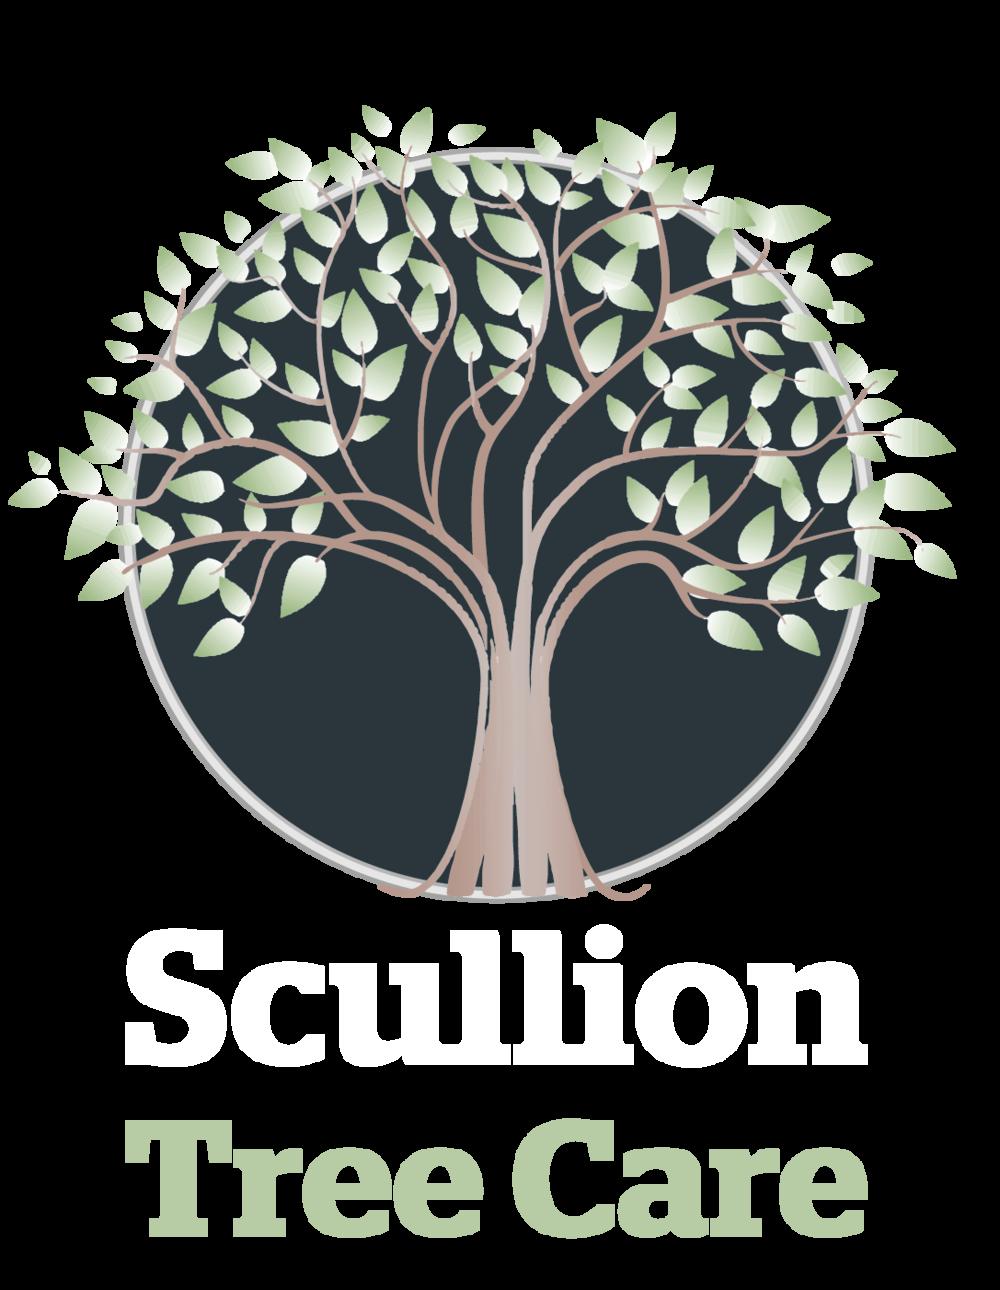 Scullion-Tree-Care-Final-Art-(WL)-01.png